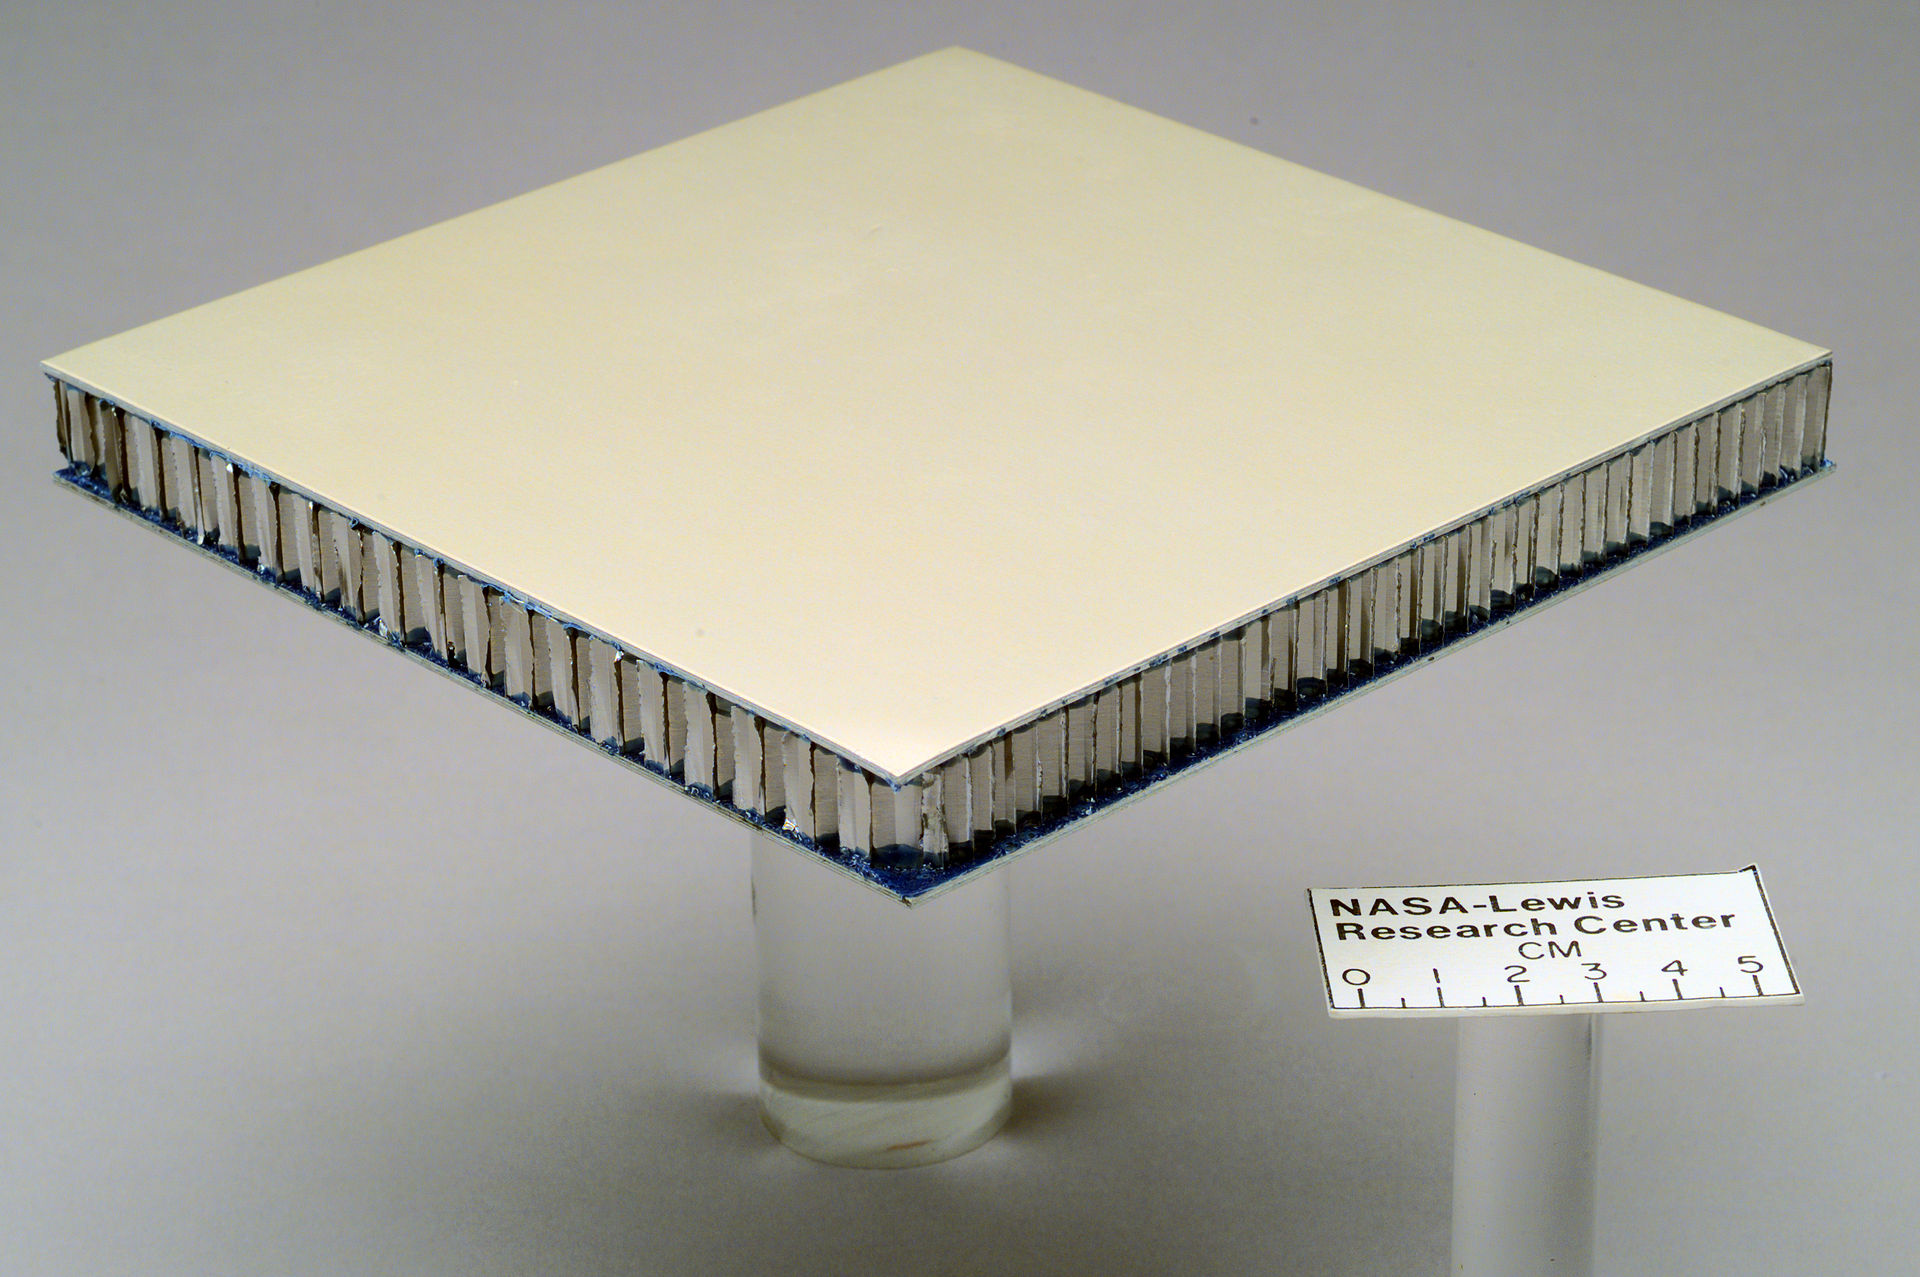 Sandwich Structured Composite : Sandwich structured composite wikipedia